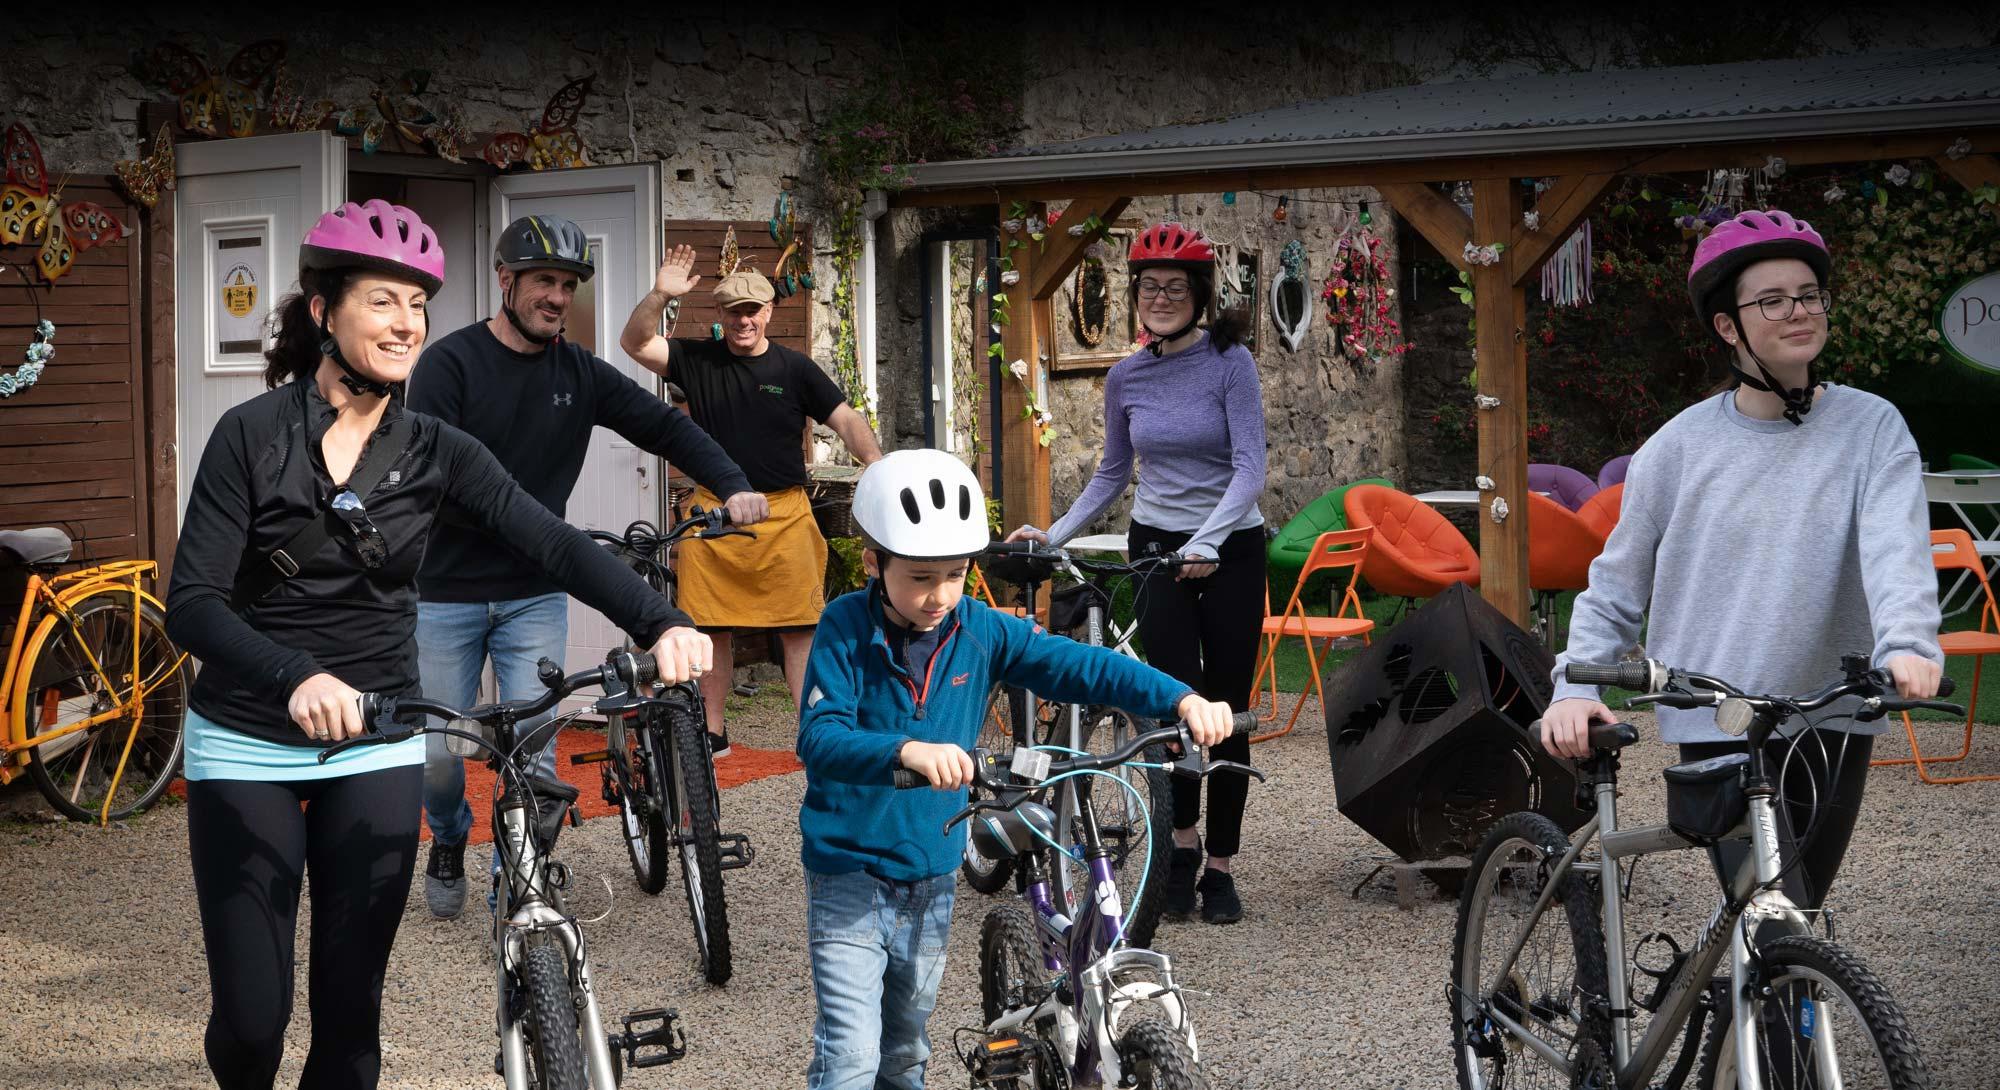 Dicks Bike Hire, Portumna, Galway - Slide 1